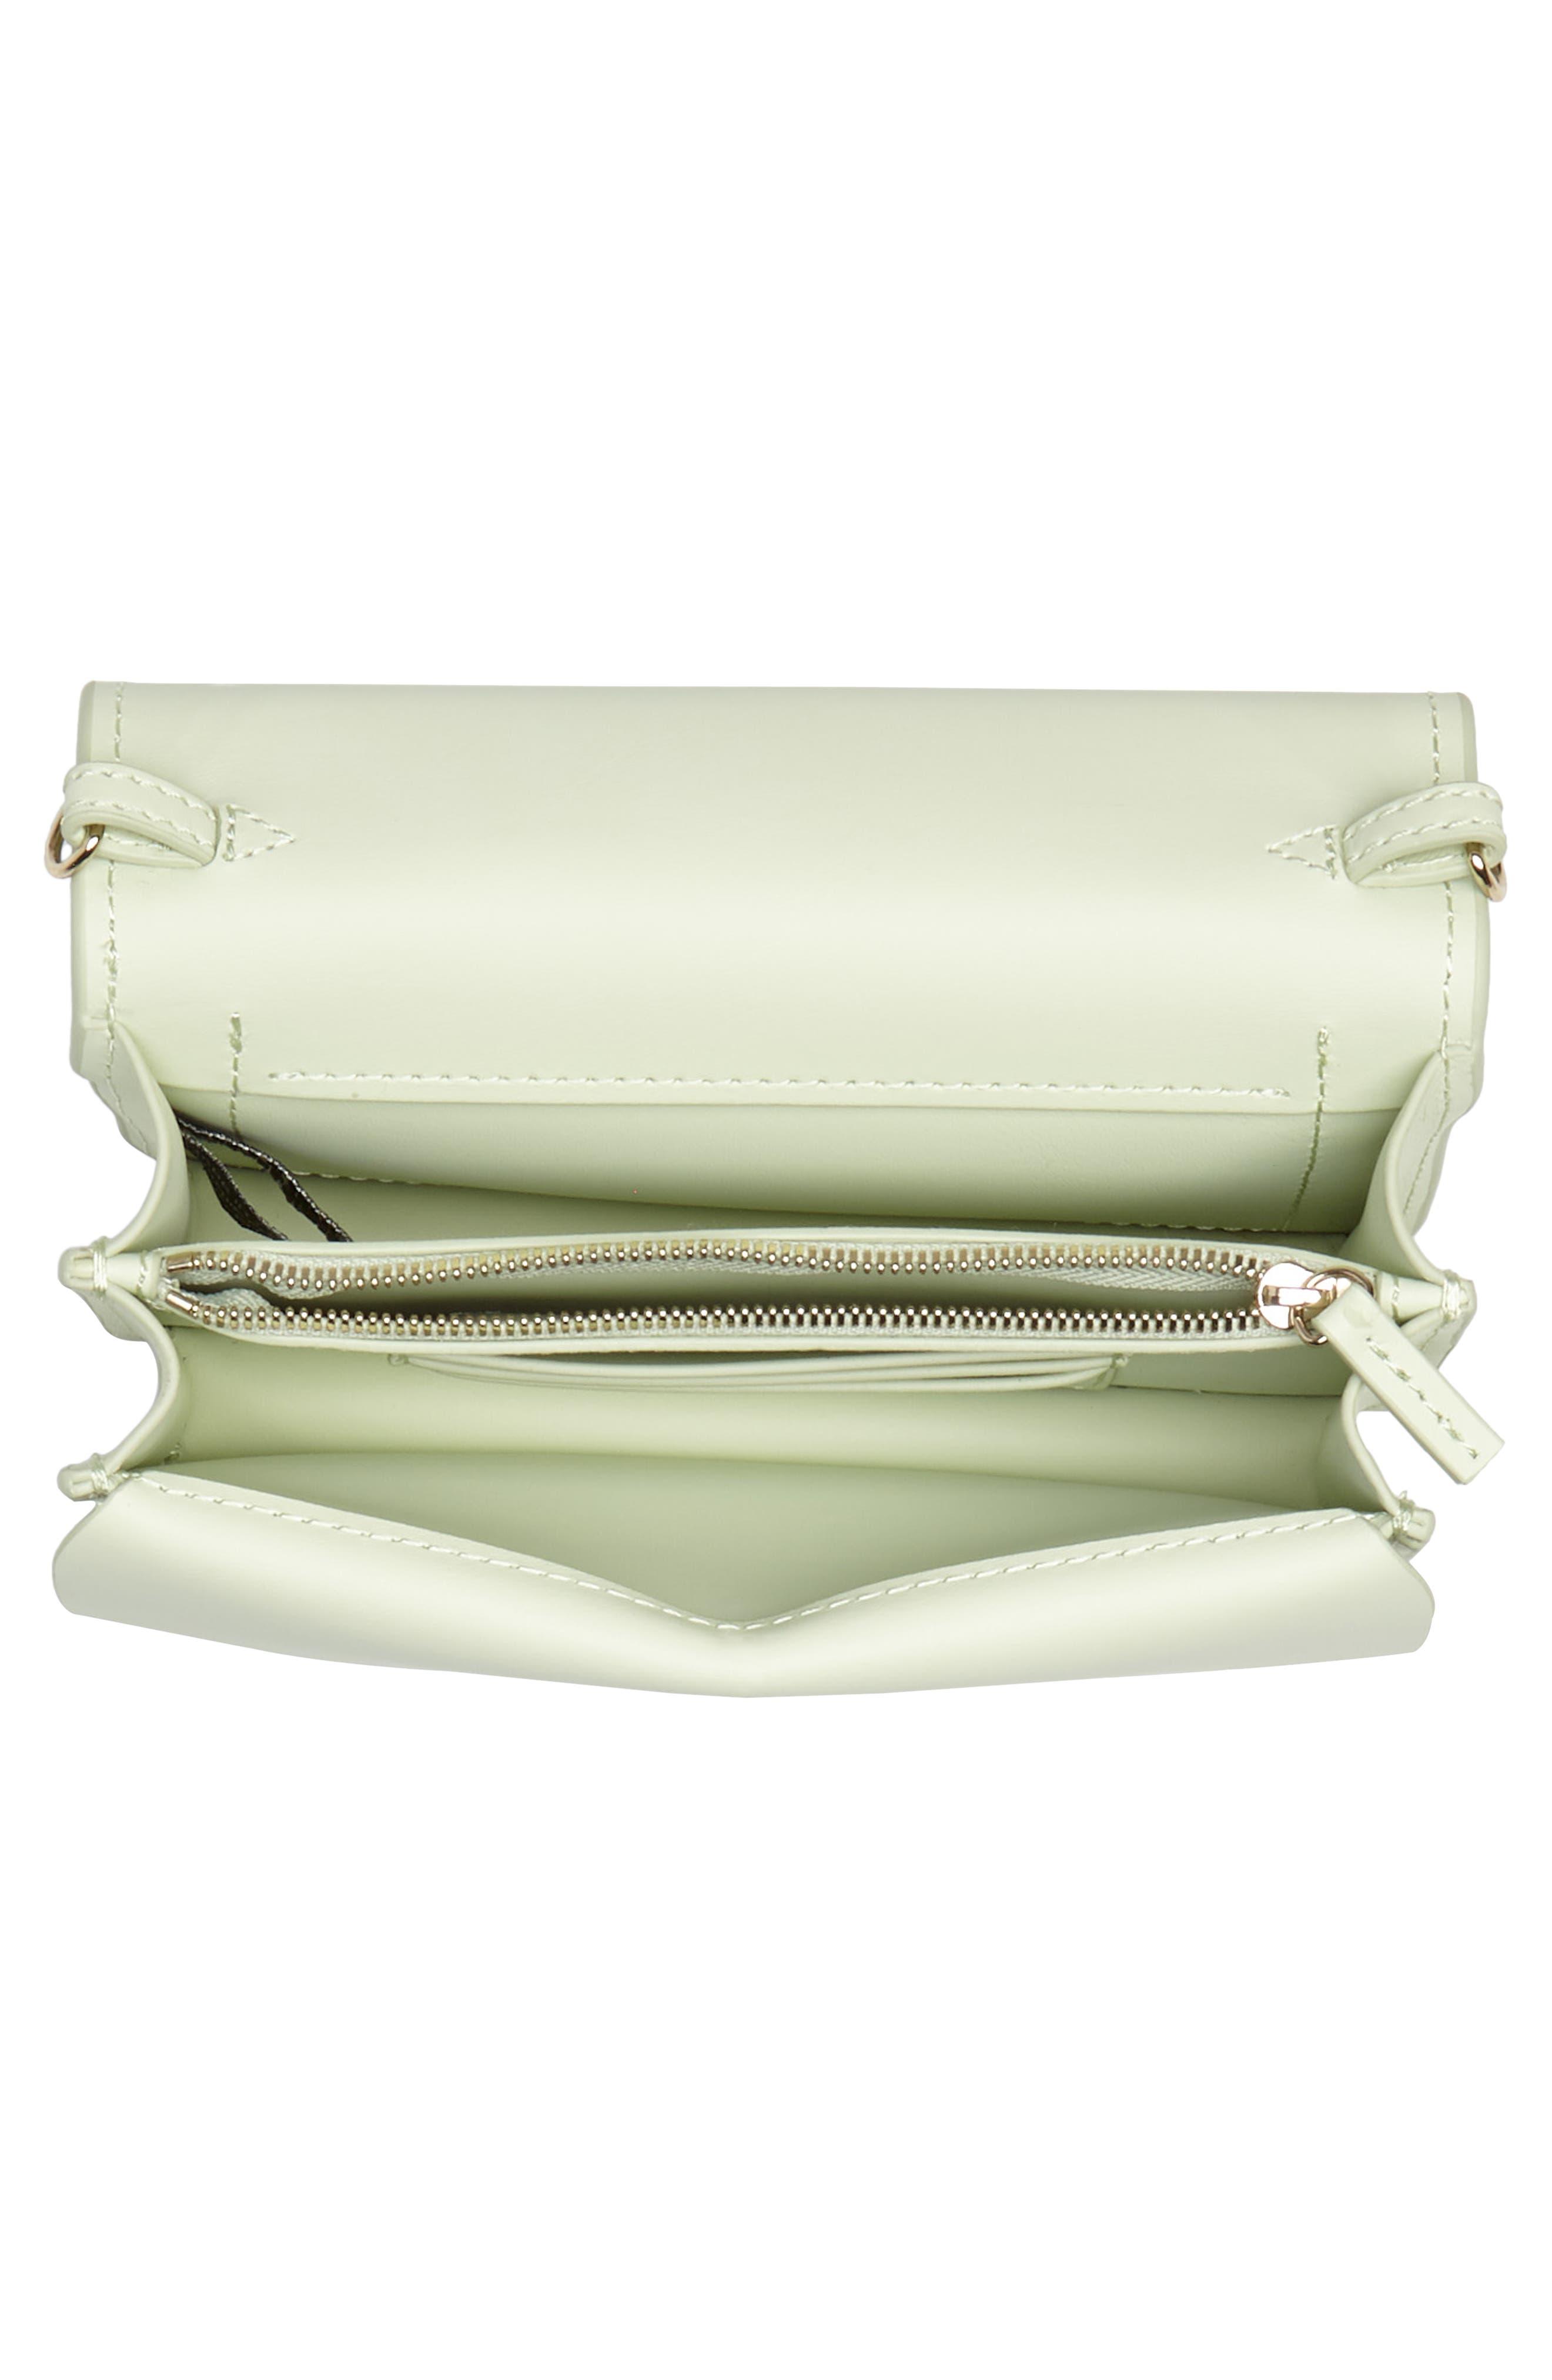 Earthette Leather Accordion Crossbody Bag,                             Alternate thumbnail 4, color,